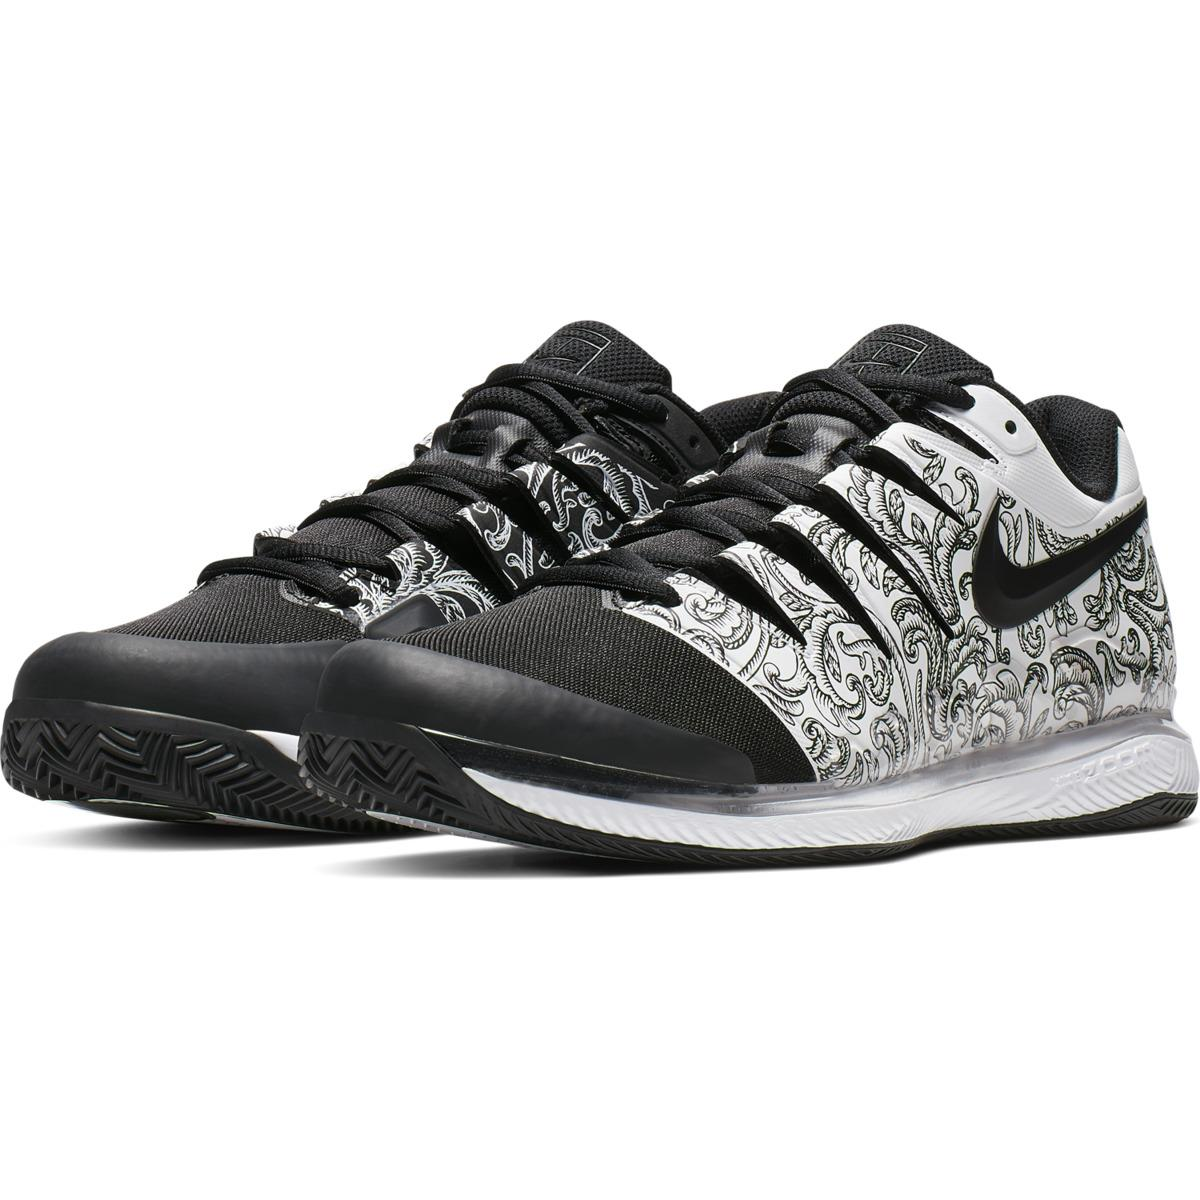 Nike Air zoom Vapor X Clay men's tennispaddle shoes